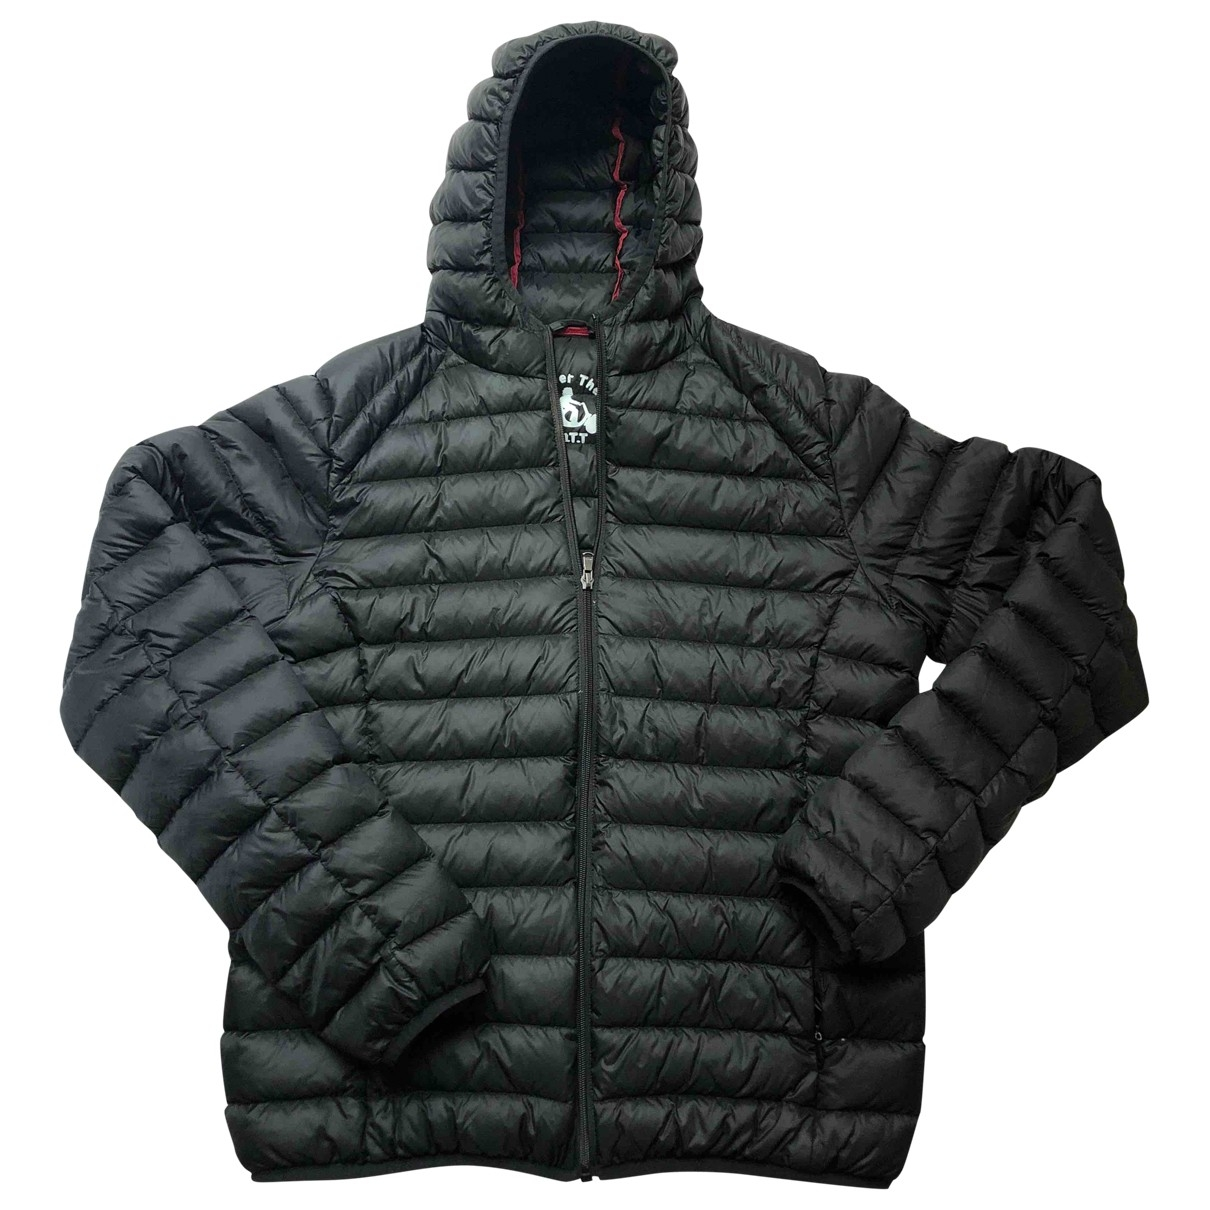 Jott \N Black jacket  for Men L International